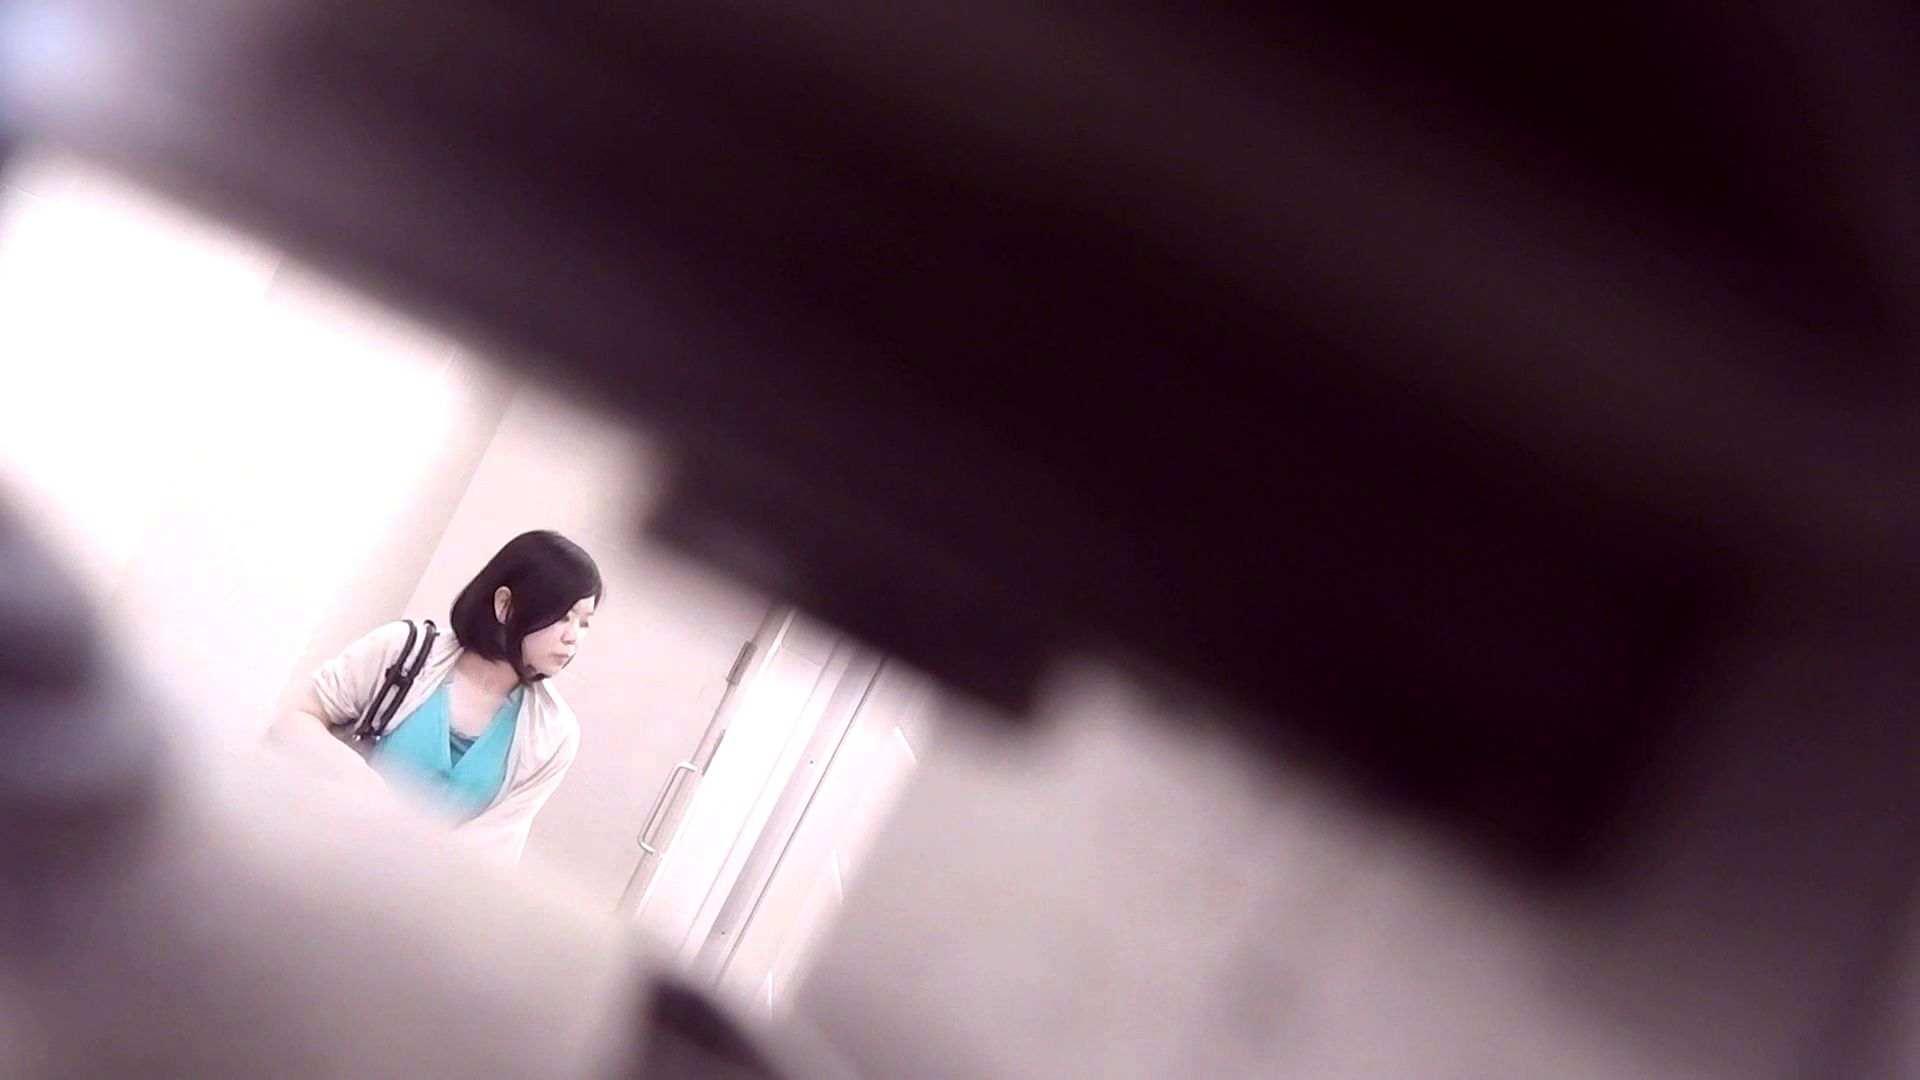 vol.16 命がけ潜伏洗面所! 美女たっぷり!! 美女 盗み撮りAV無料動画キャプチャ 84pic 43